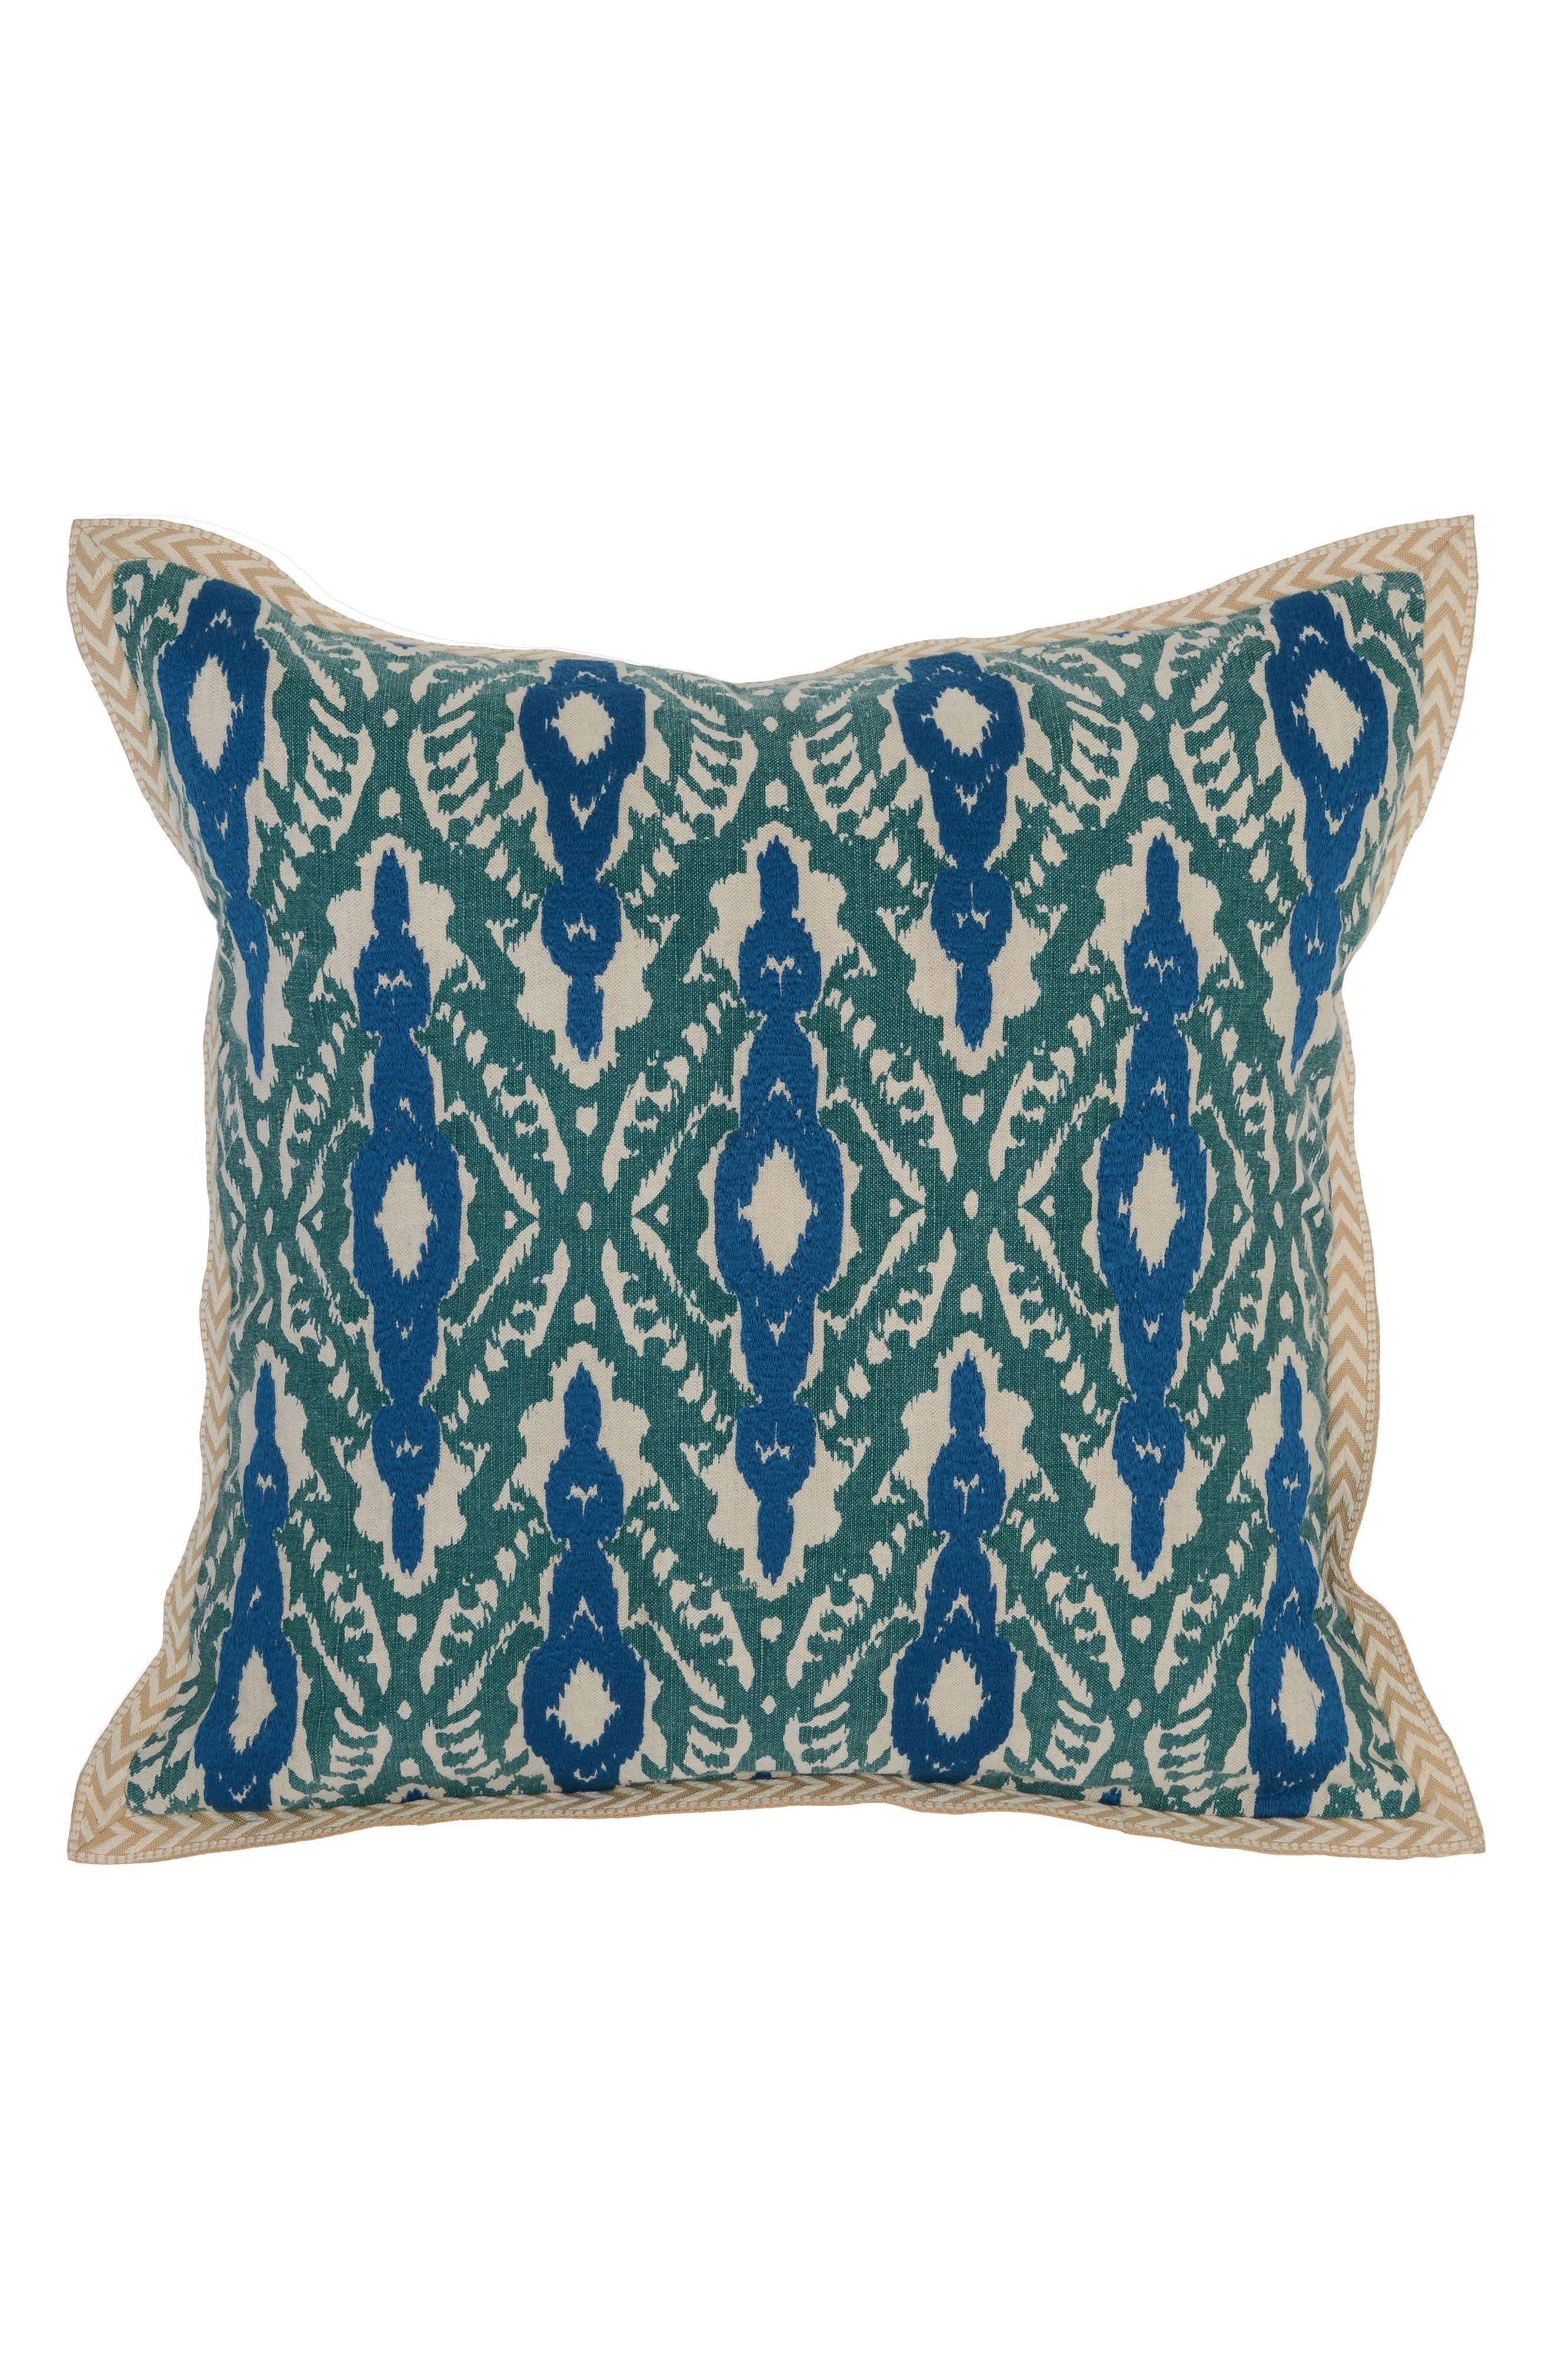 Bali Accent Pillow,                             Main thumbnail 1, color,                             400